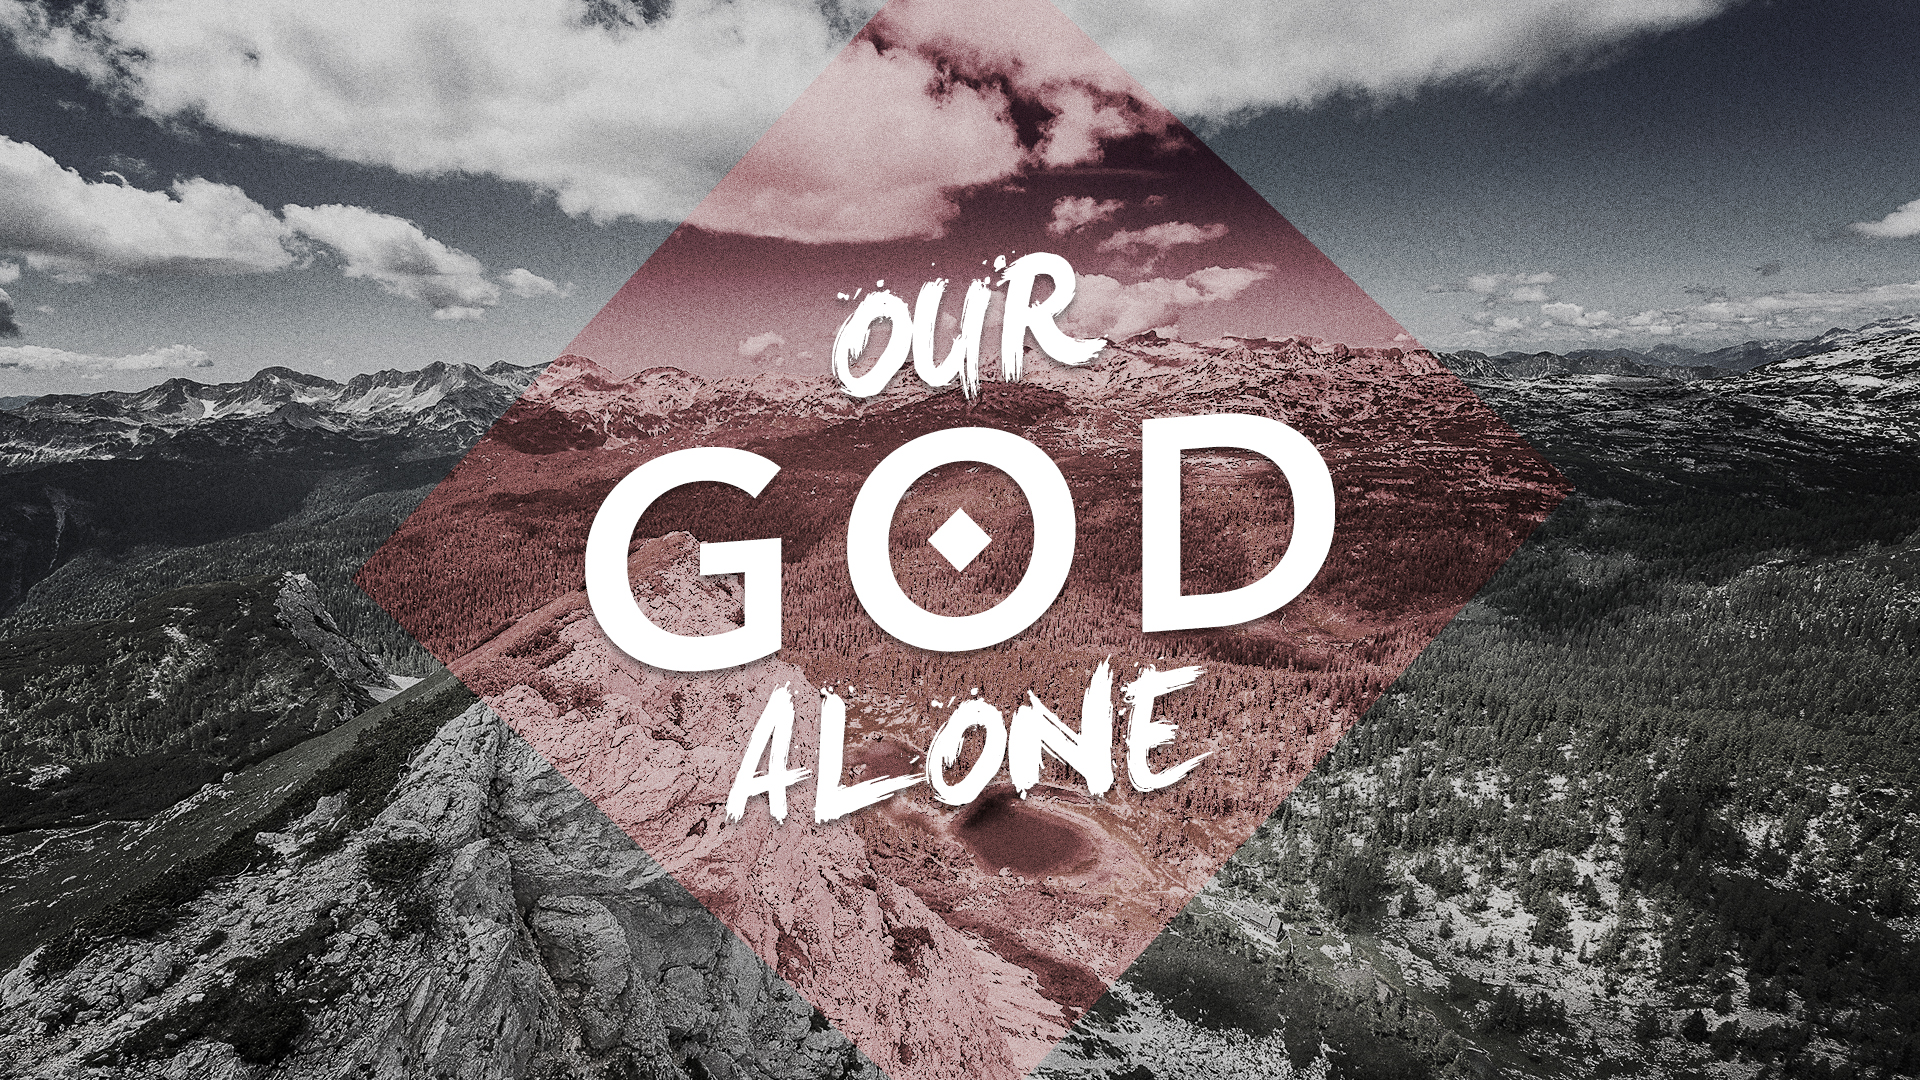 Our-God-Alone.jpg